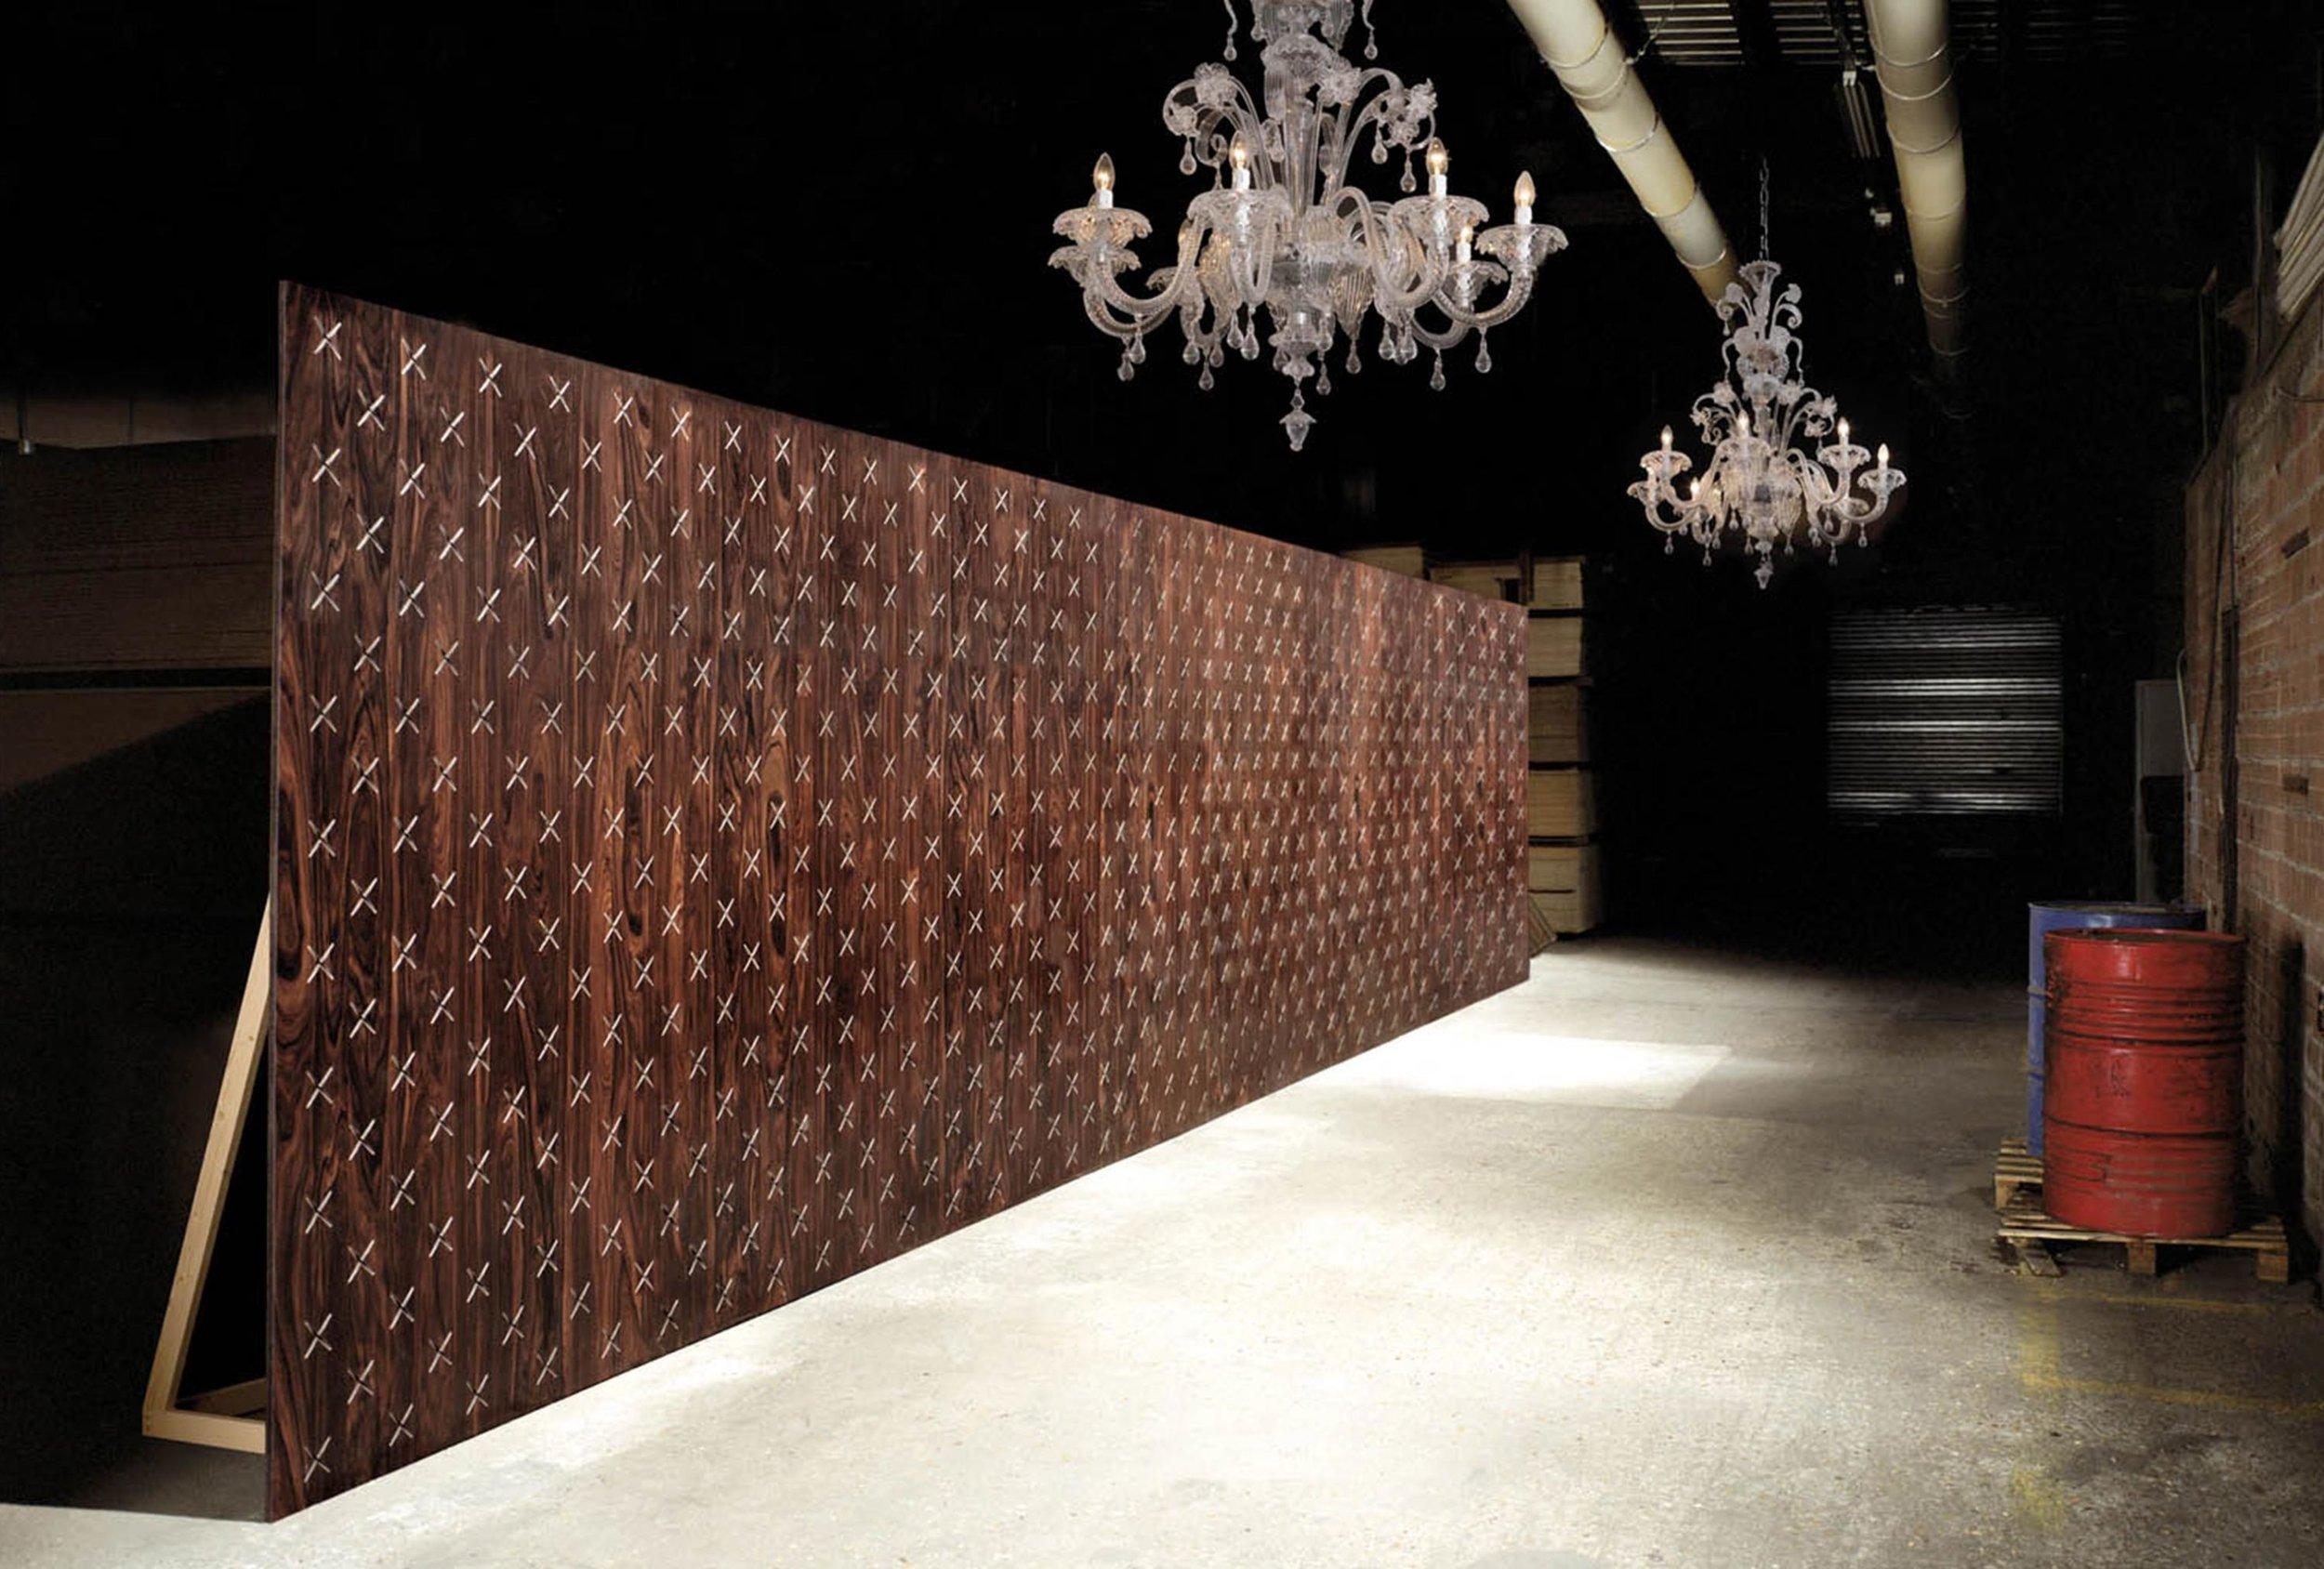 2008-oberflex-obersound-espace-photo-mur-bois.jpg